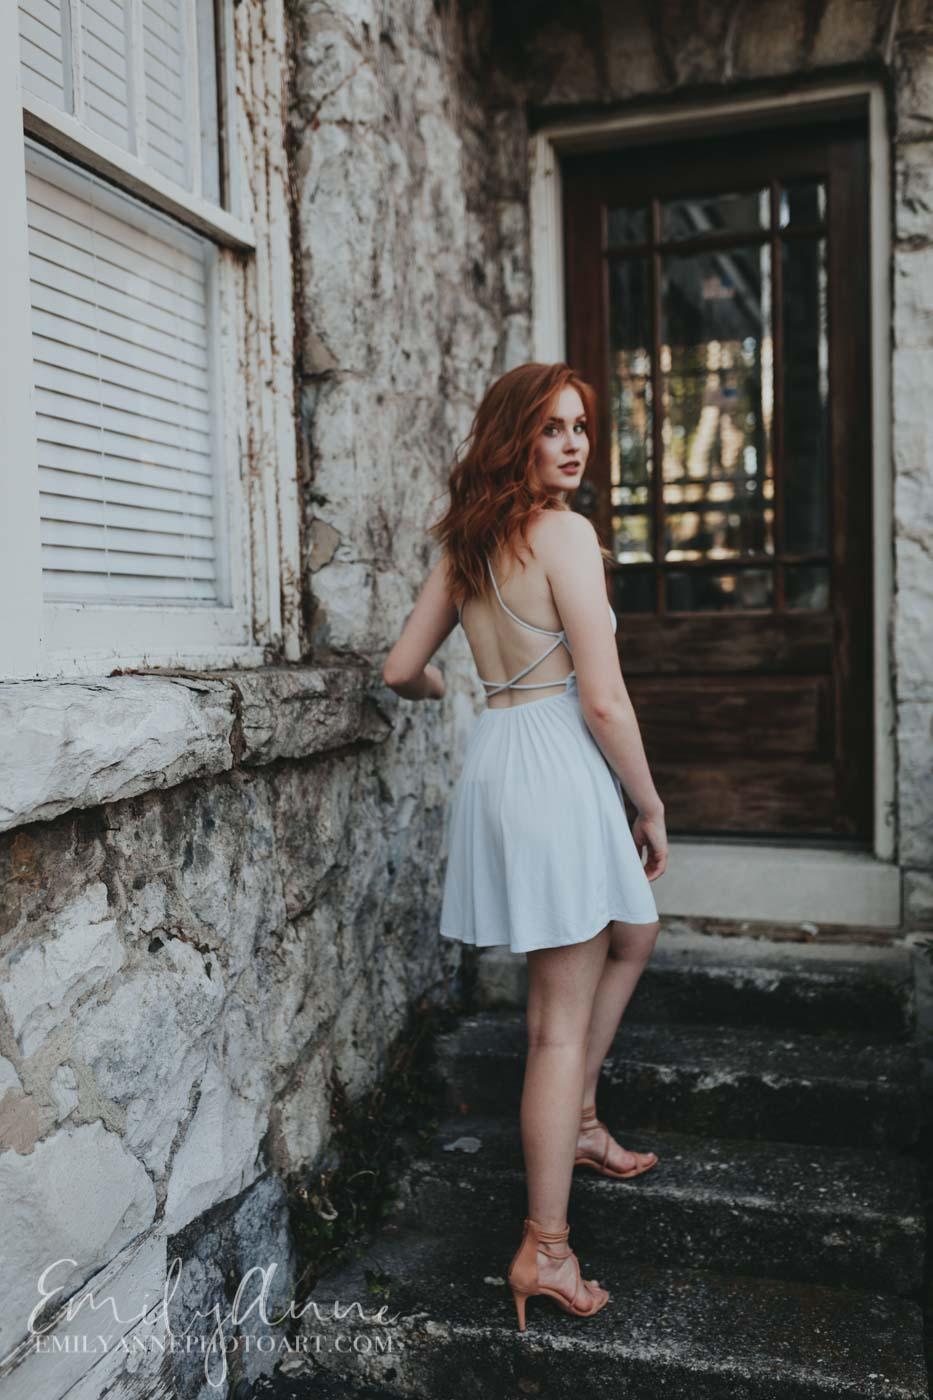 Downtown Franklin/Nashville Model photography Emily Anne